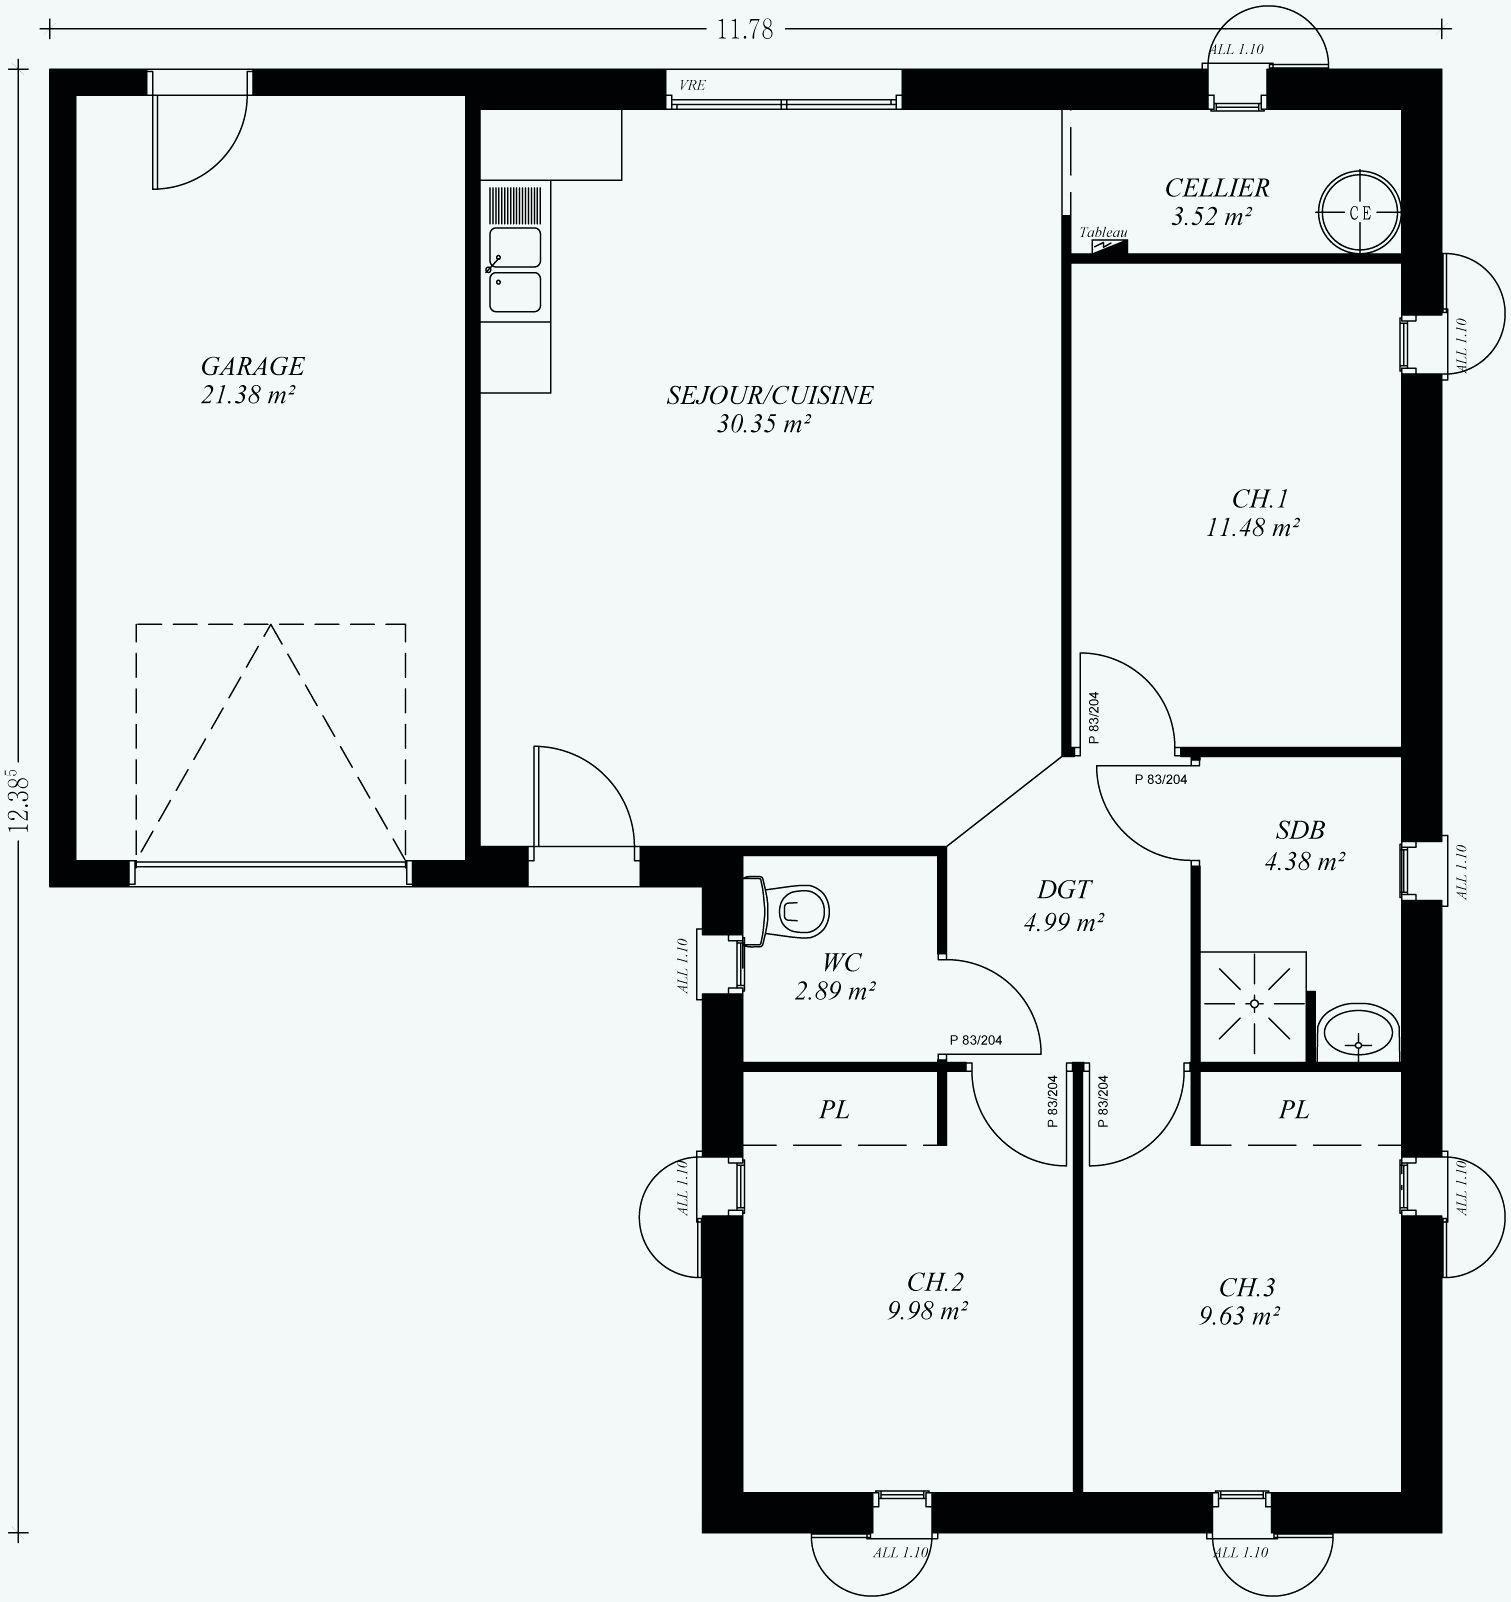 Maison Plan plan-maison-100m2-a-2-etage Plan Maison A Etage 100m2 en 2020 | Plan maison, Maison ...